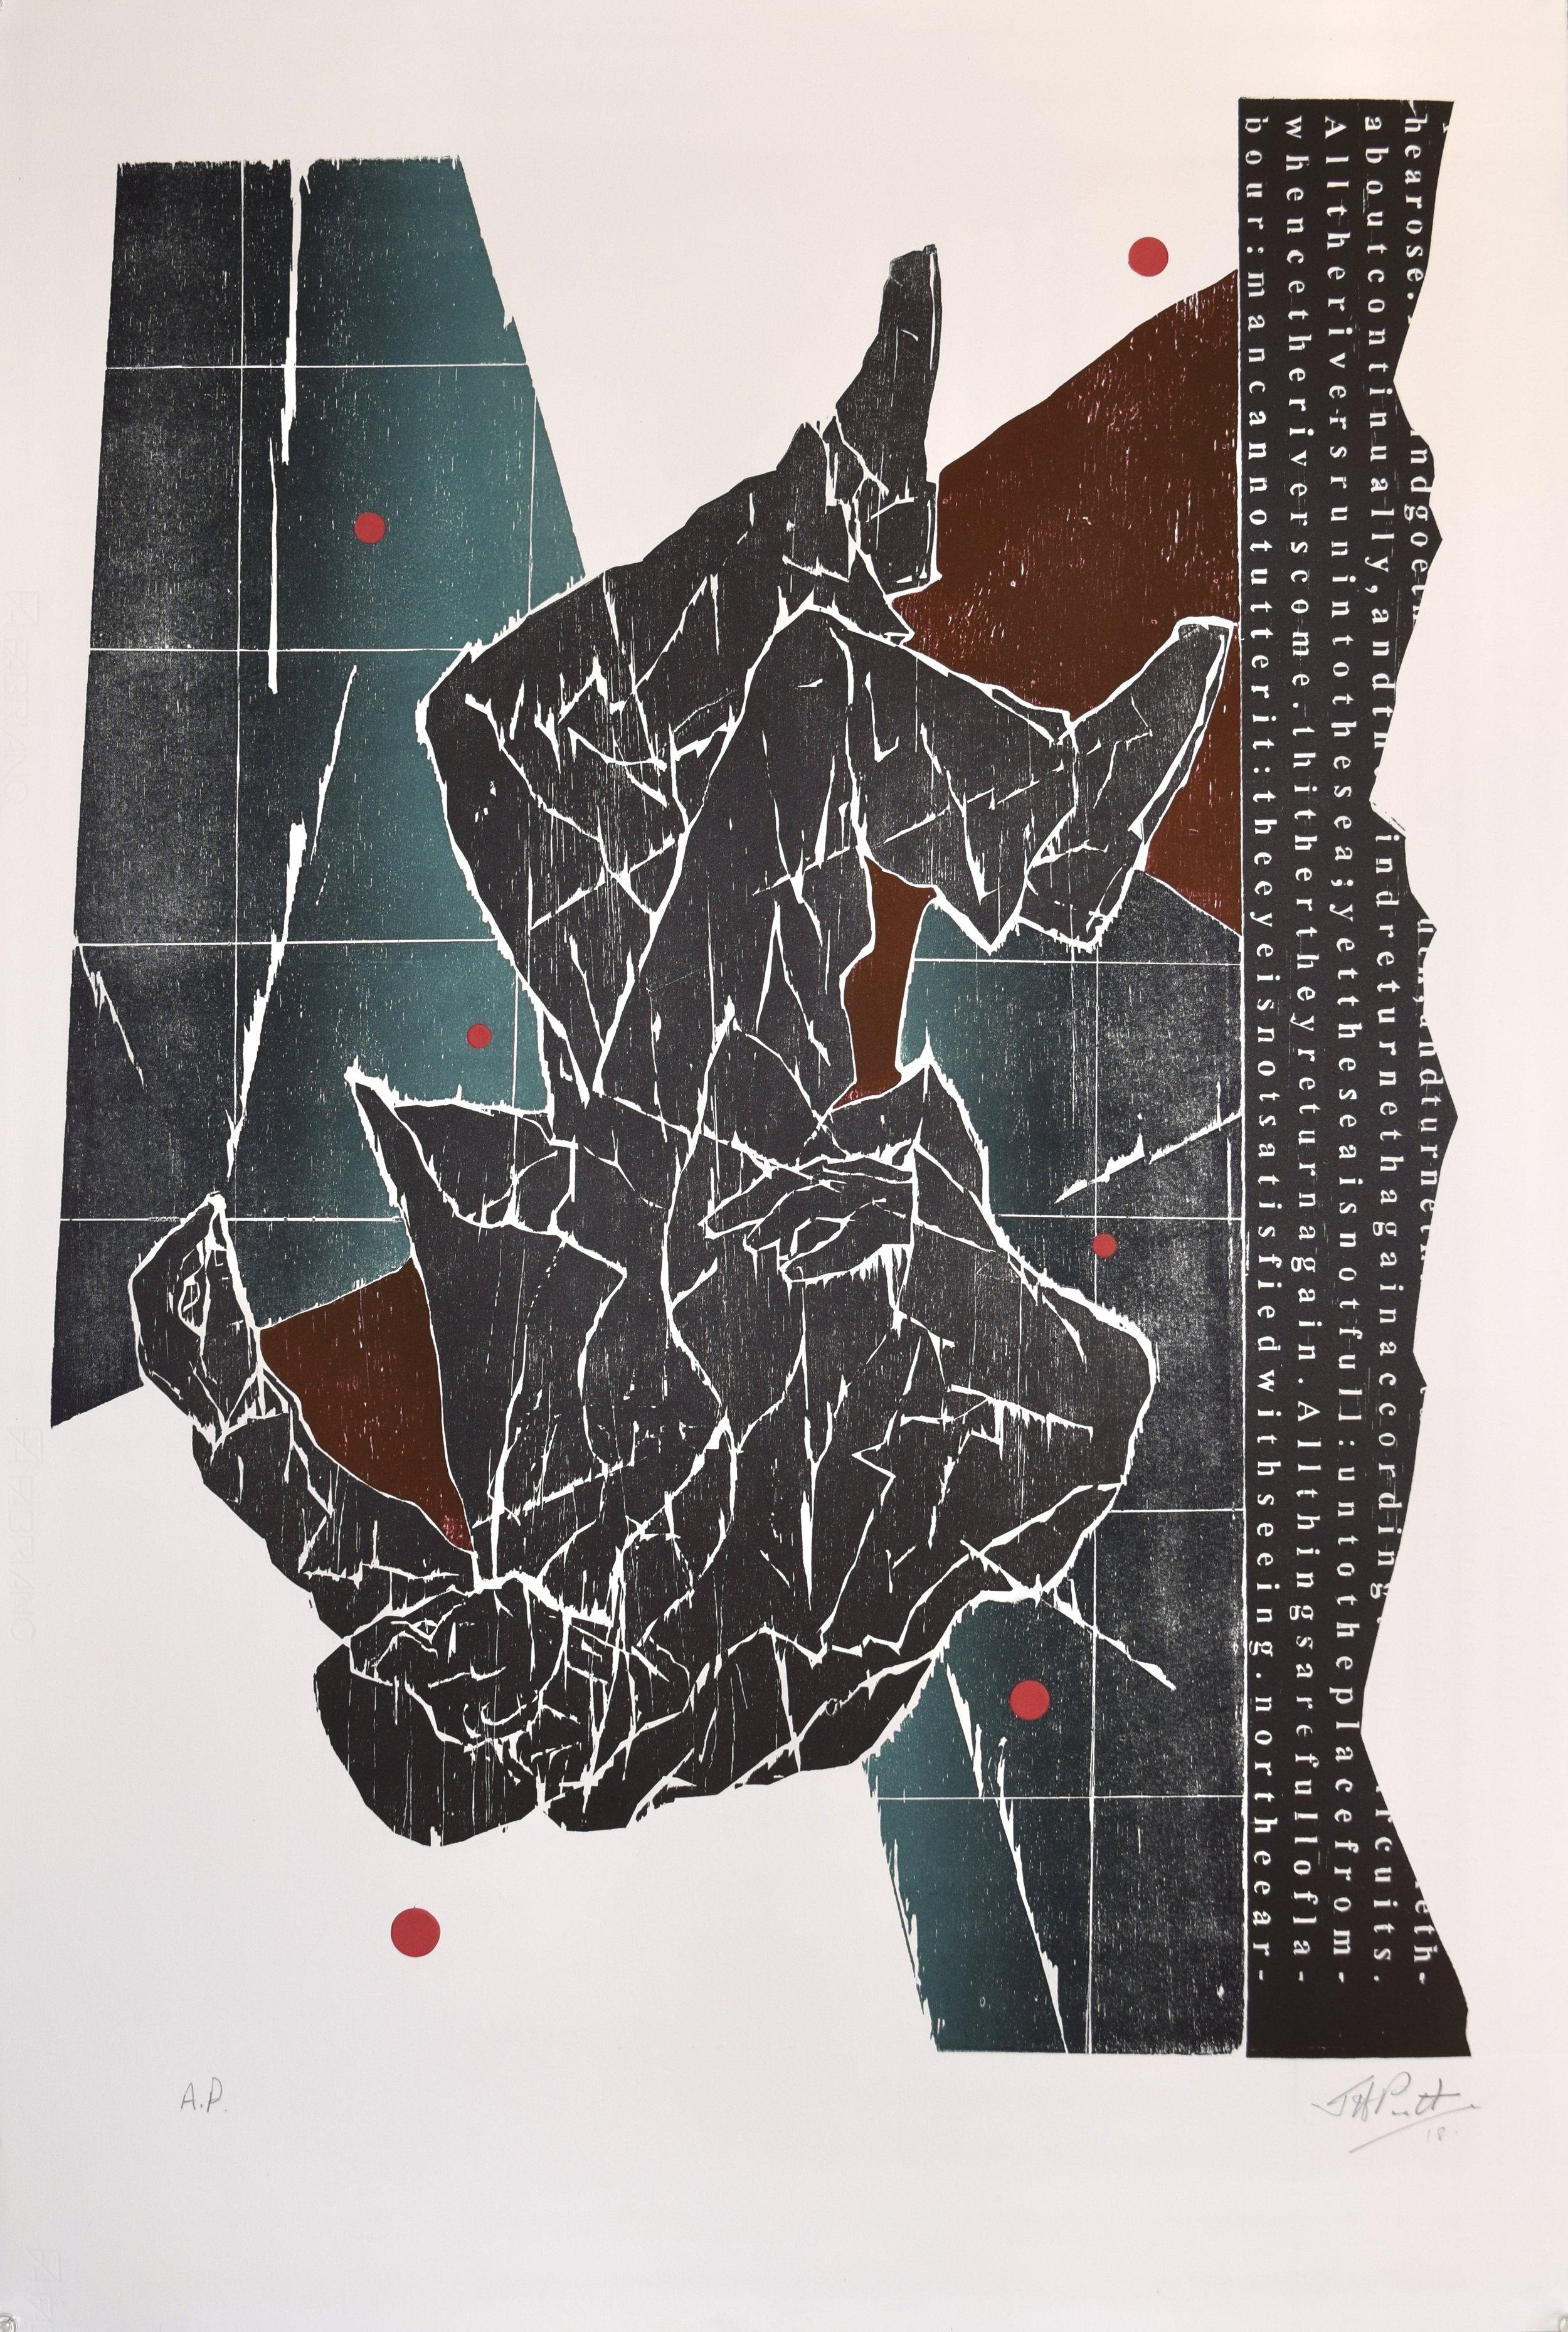 Untitled , John Pratt, woodcut/collage, 2018